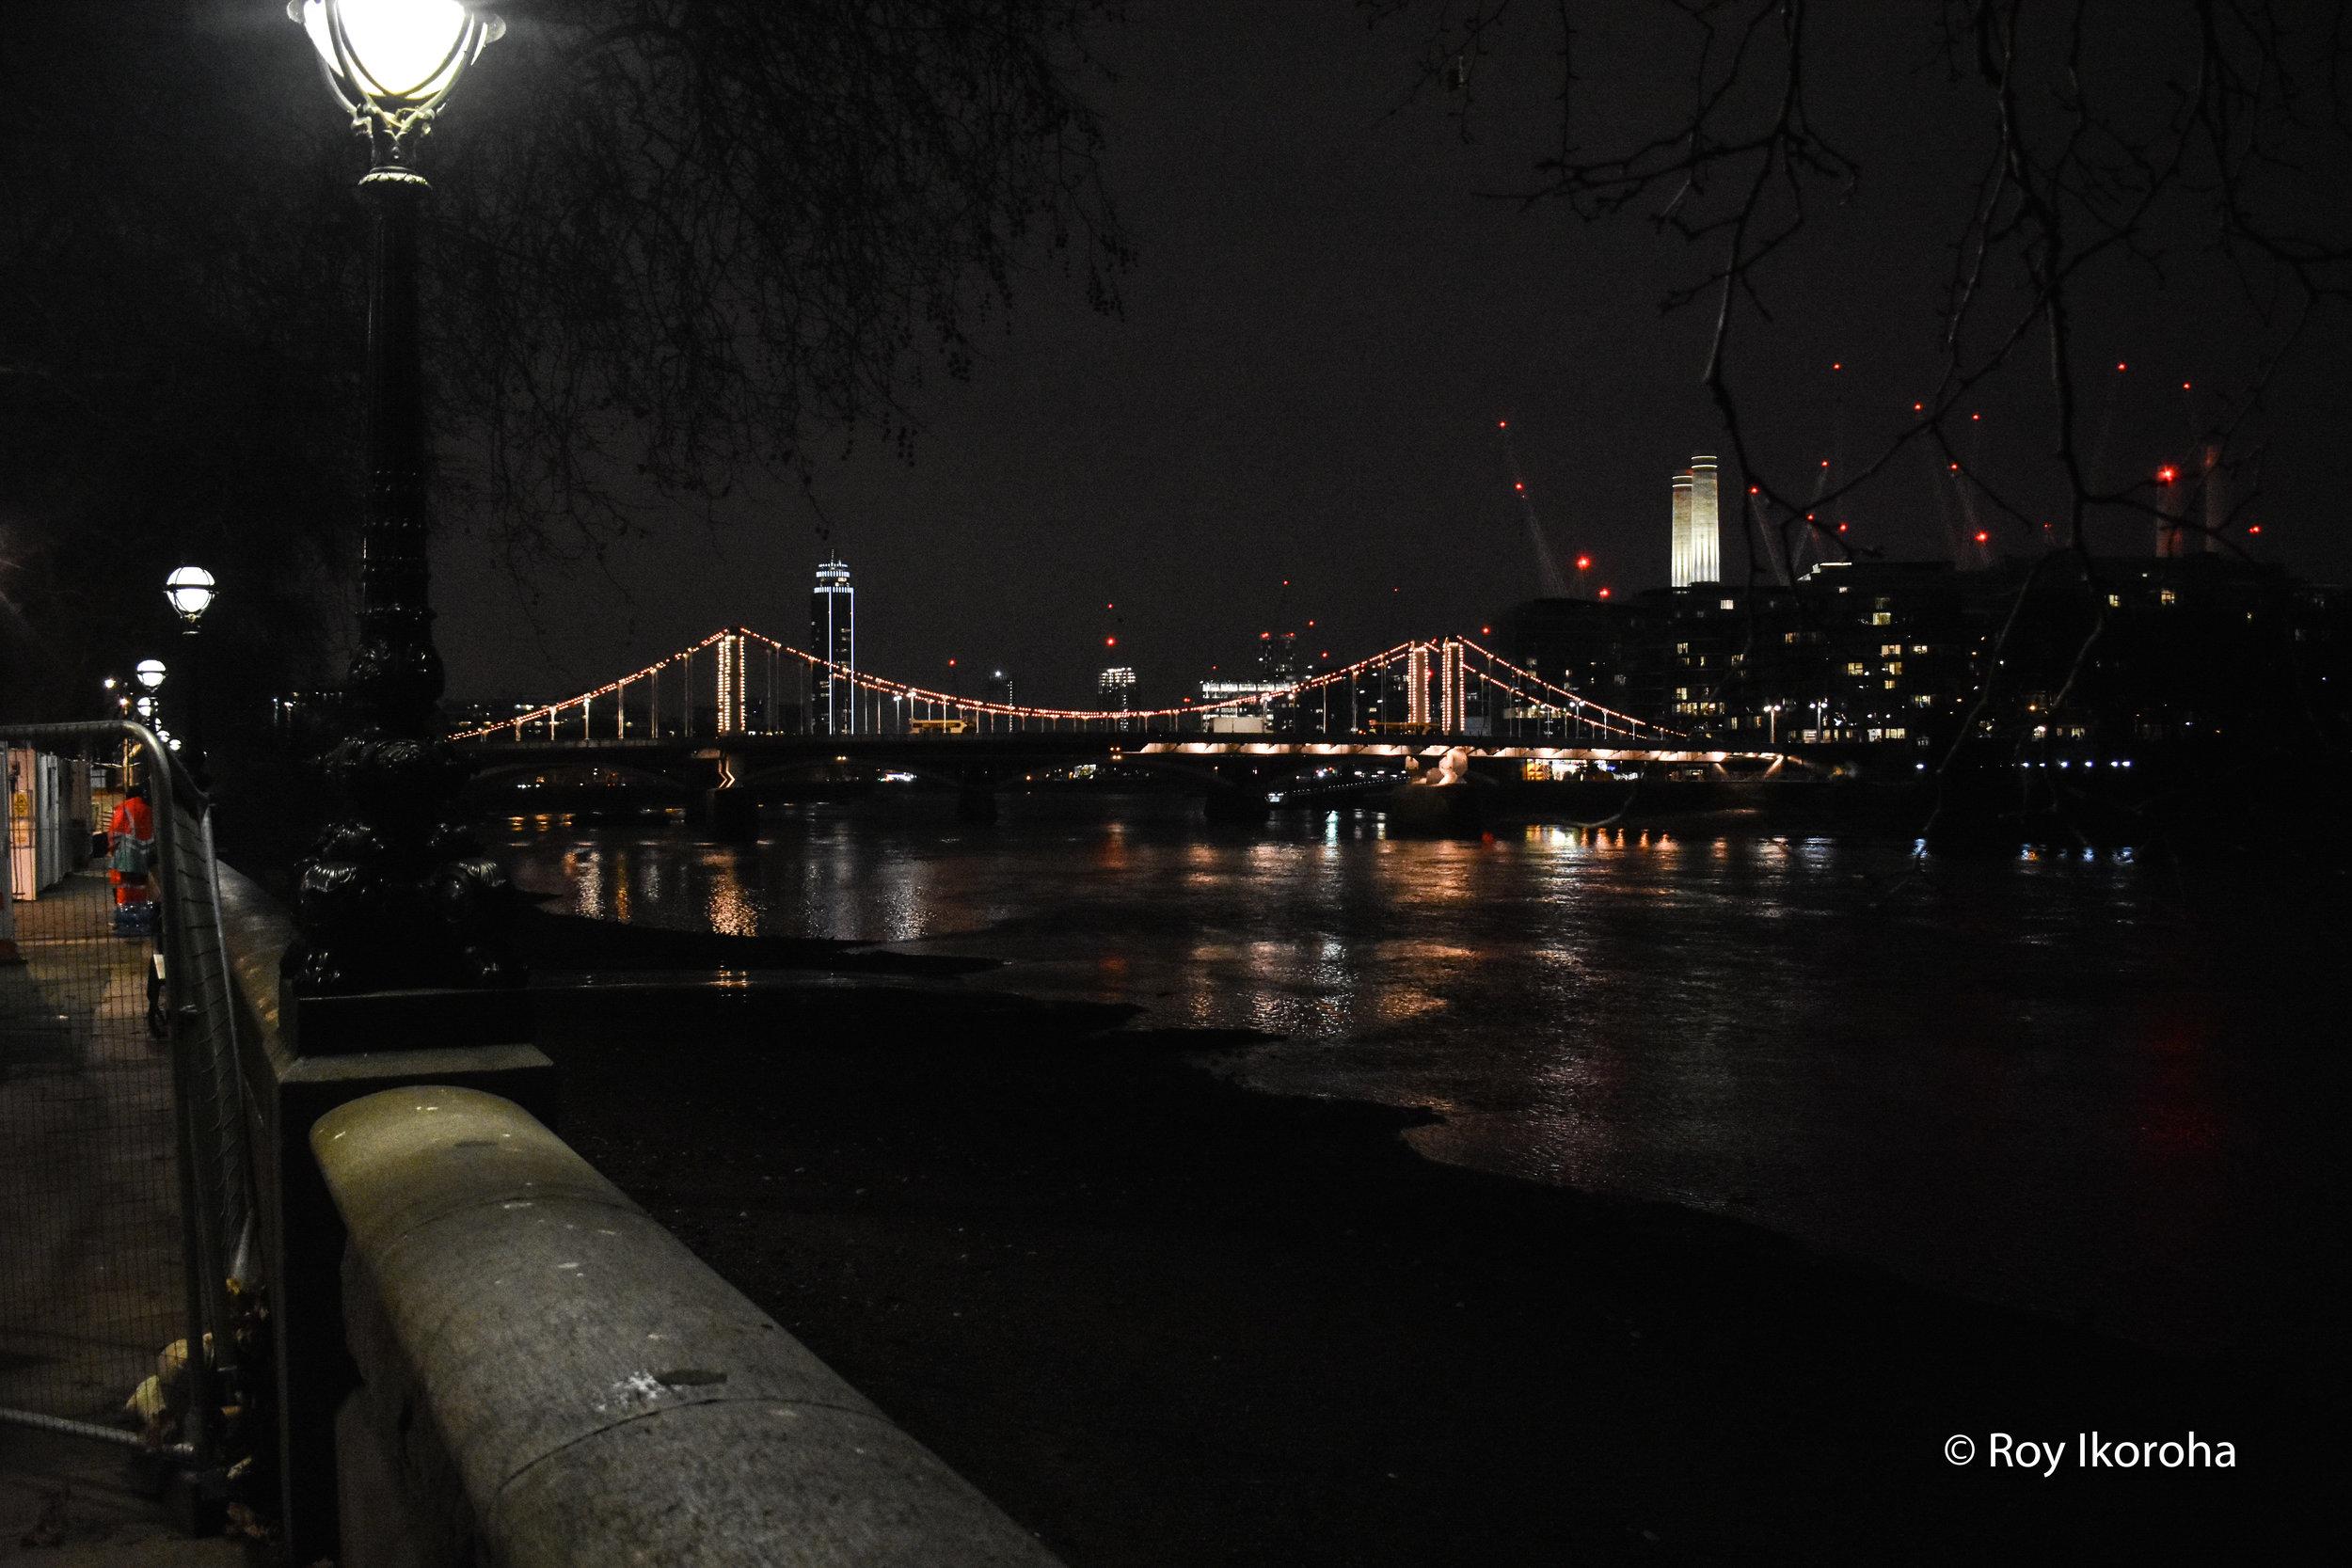 Chelsea Embankment/Bridge, Chelsea, London